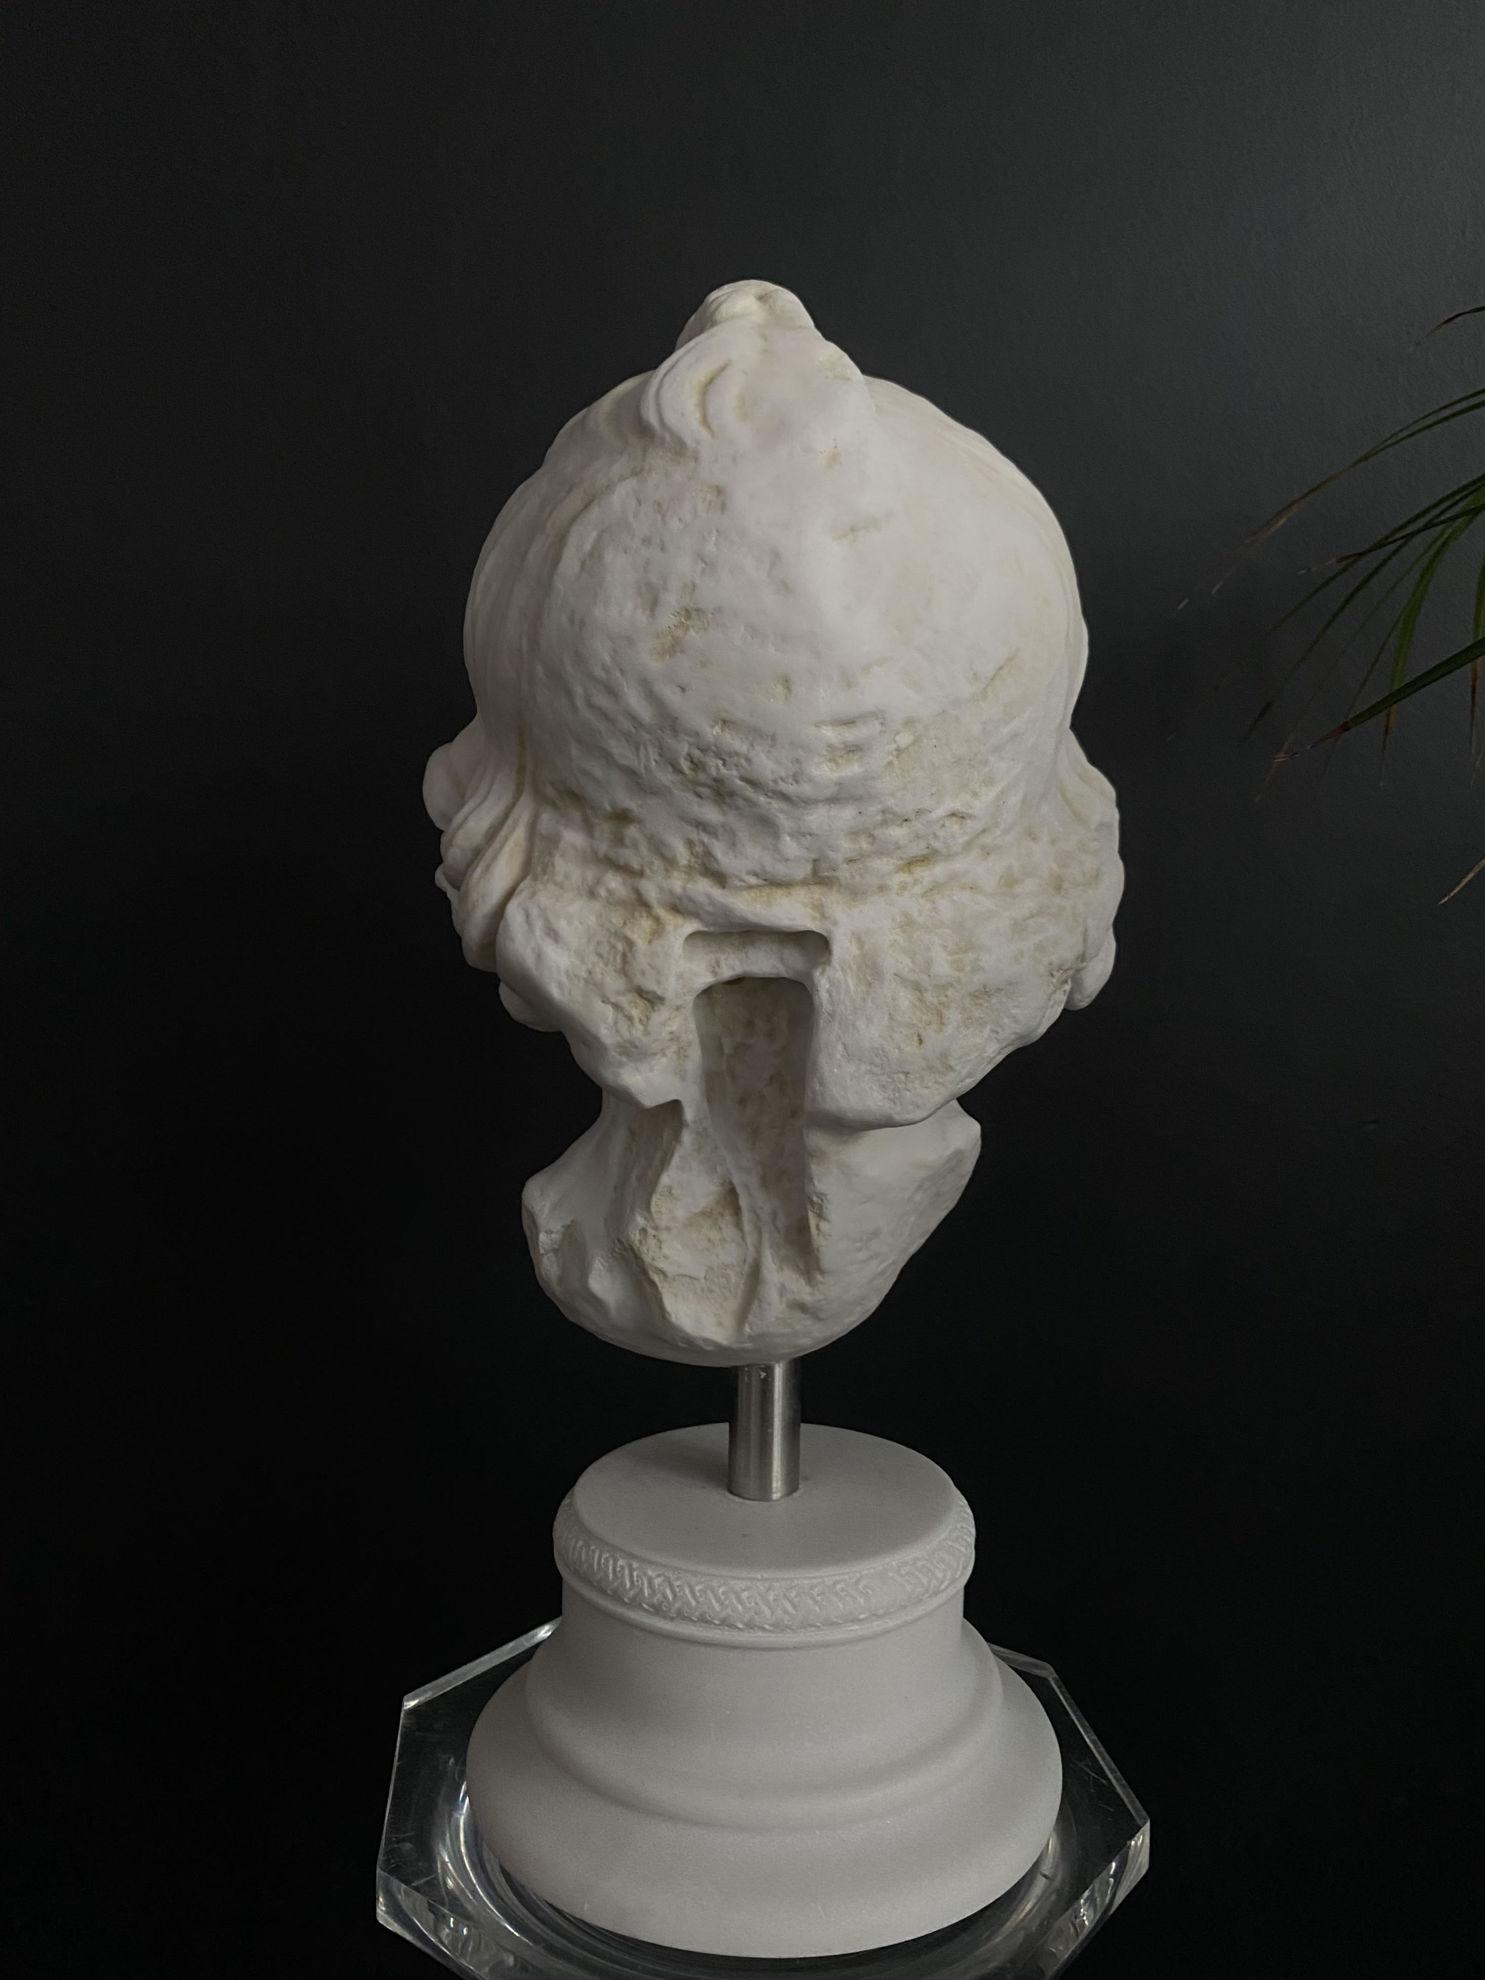 Mermer tozu sikistirma bust heykel no:16 resmi